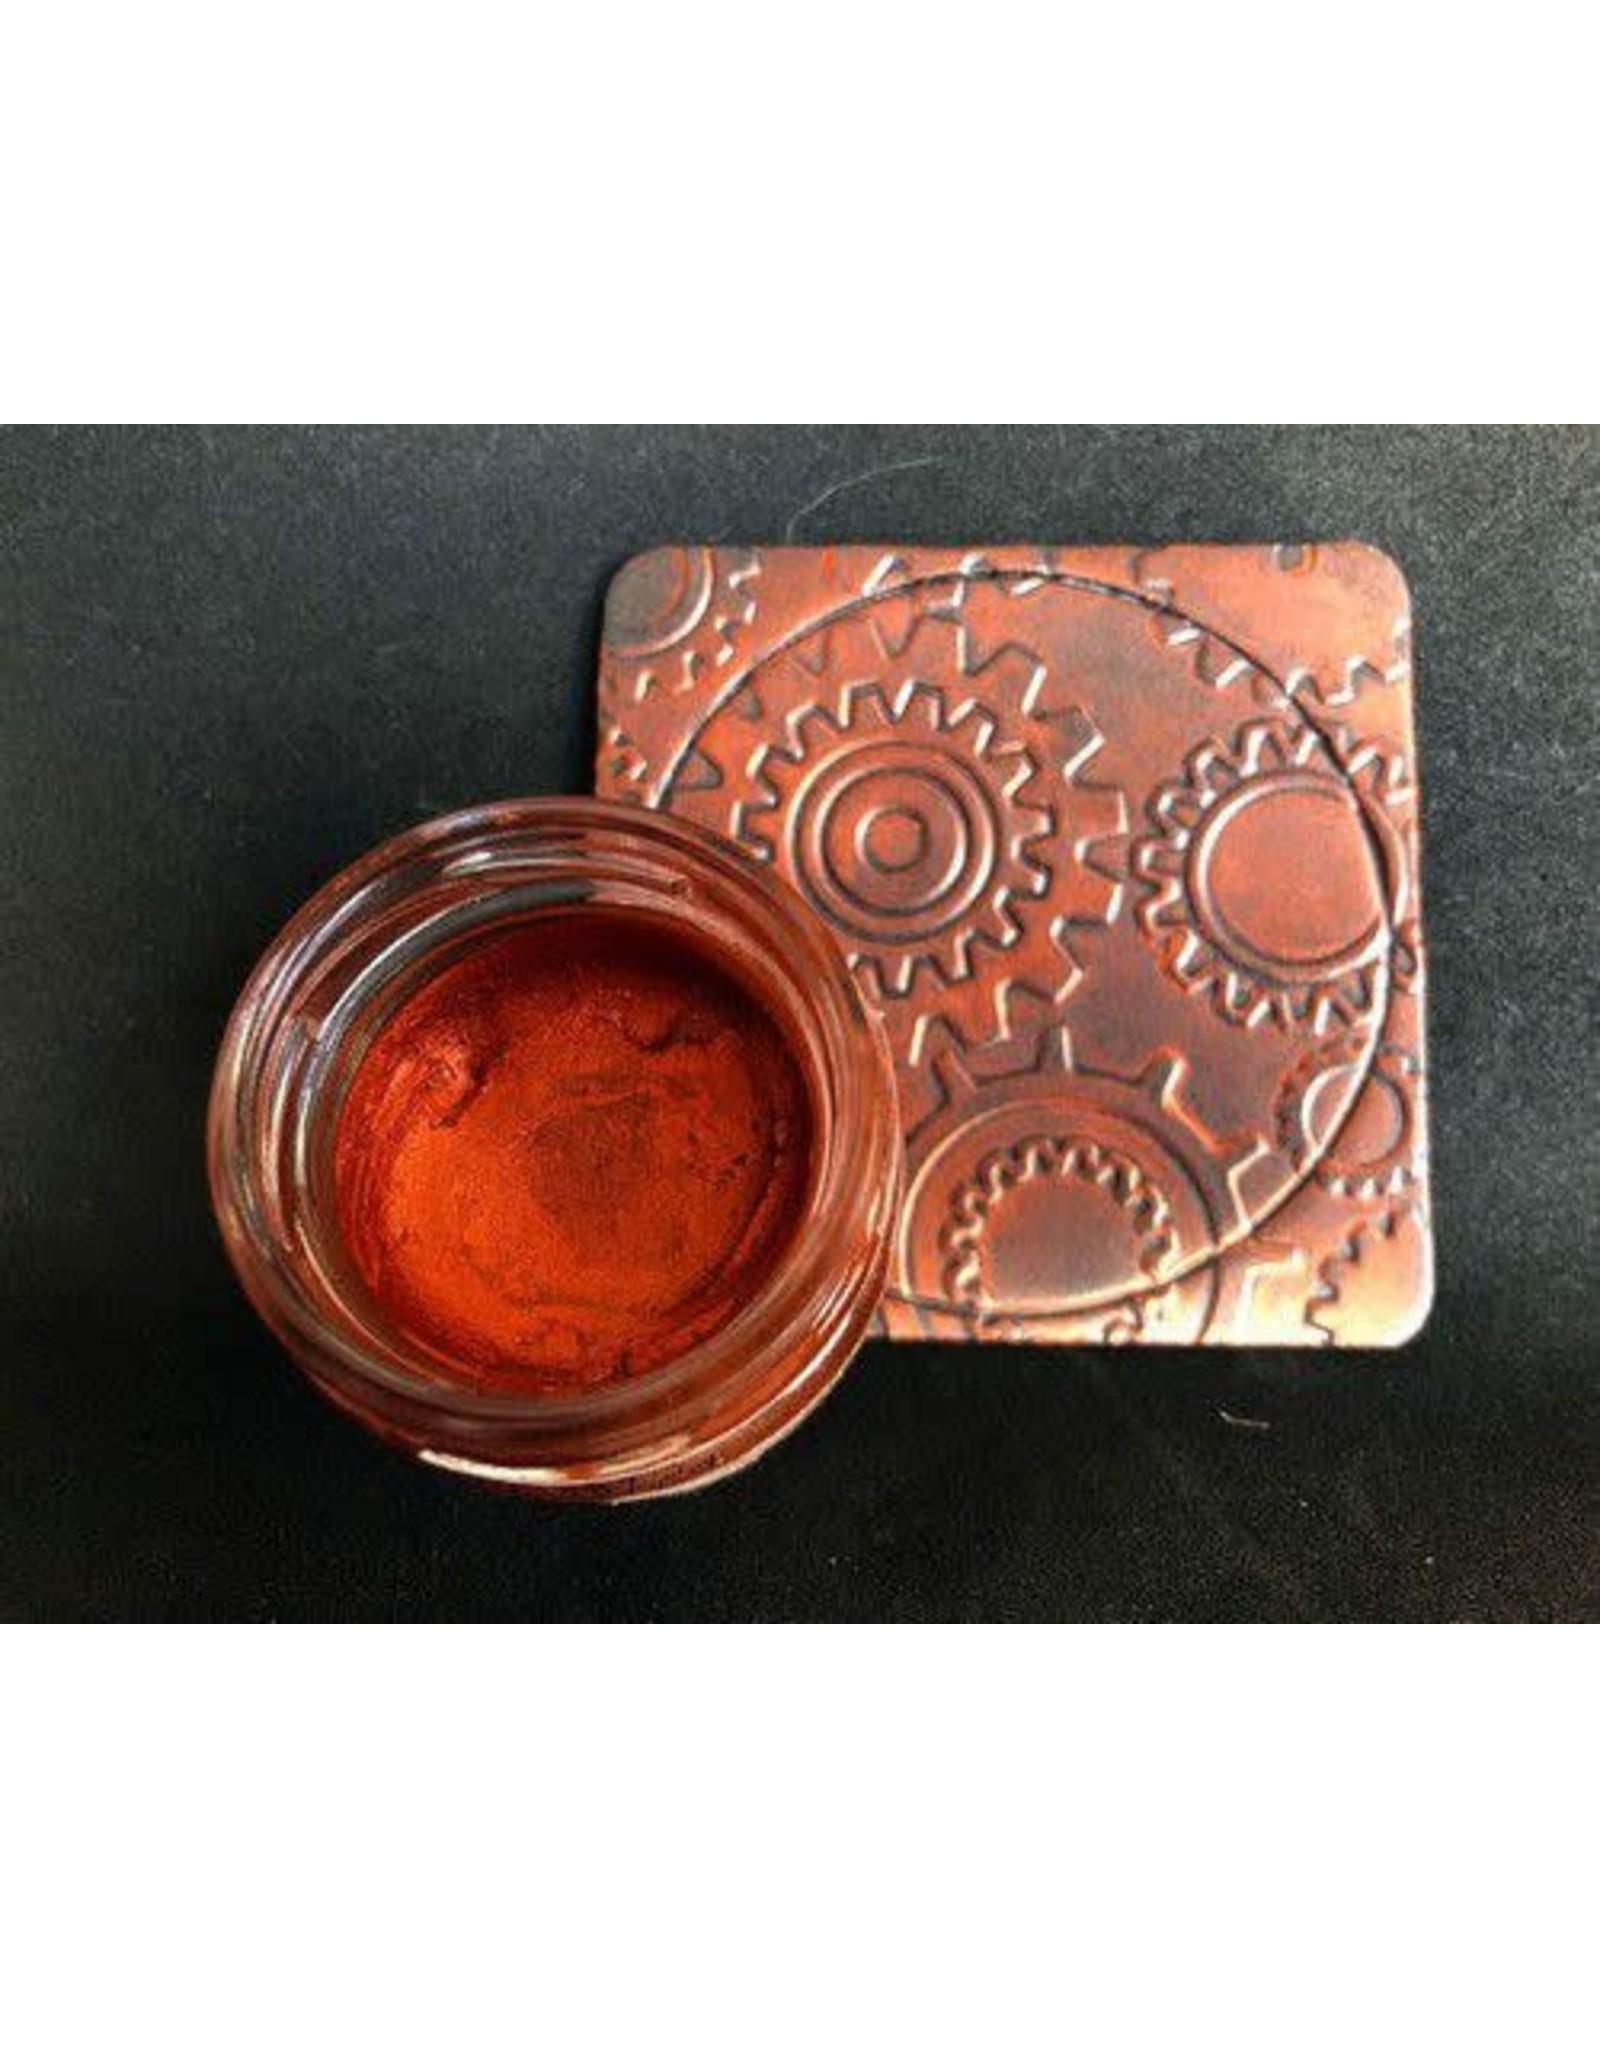 COOSA Crafts Wax COOSA Crafts Gilding Wax - Jewel Fire Agate COC-078 20 ML